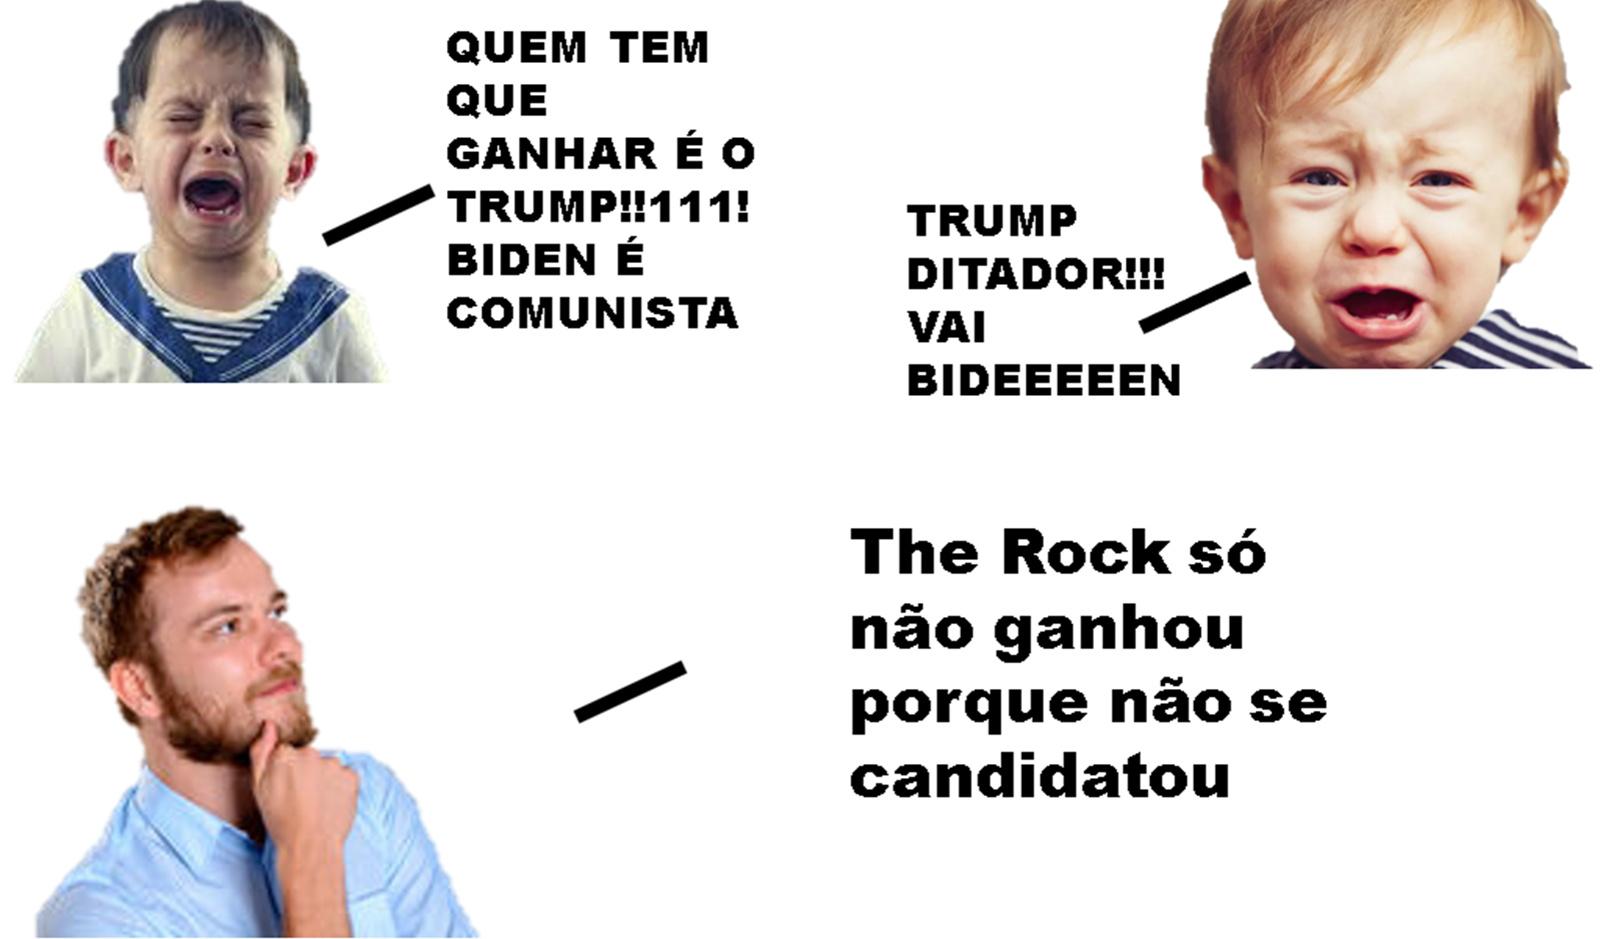 the rock presidente 2024 - meme